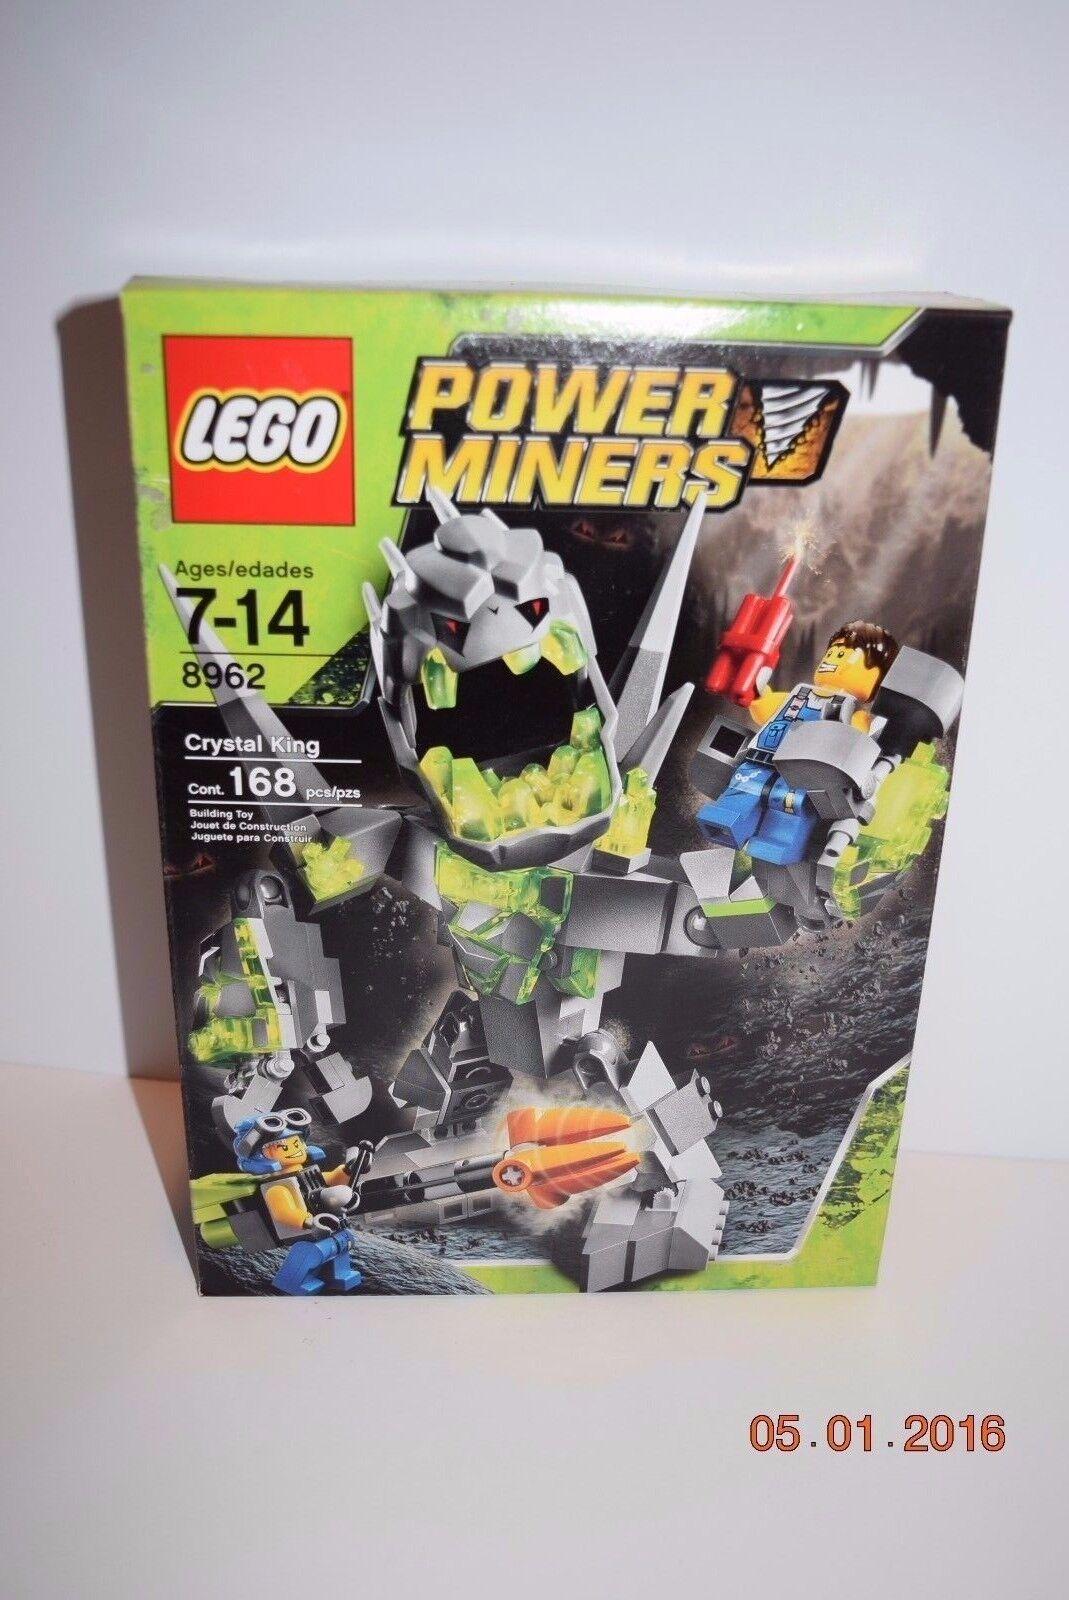 Lego Power Miners 8962 Crystal King7+, 8956,8959,8960,8961   RetiROT    NEW